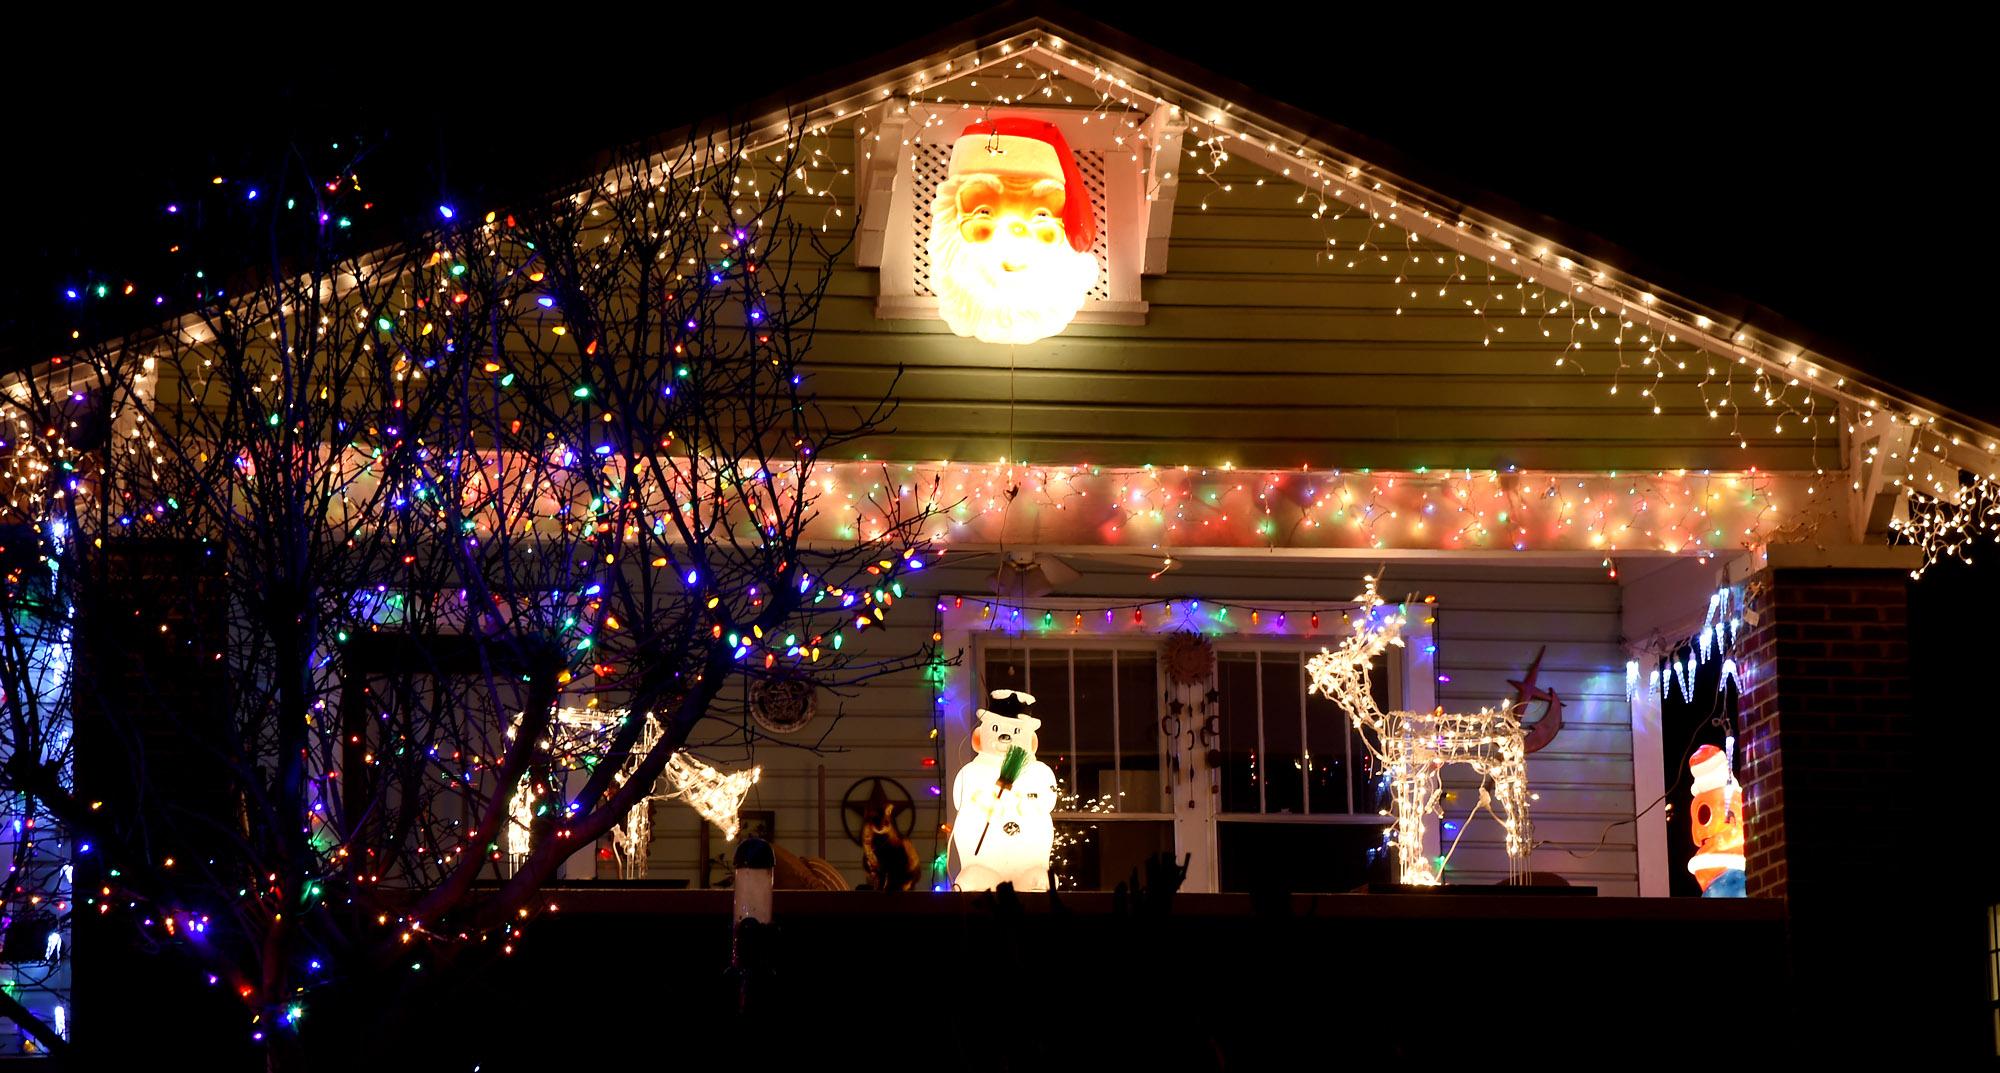 Birmingham Christmas Lights.Christmas Lights The Birmingham Times